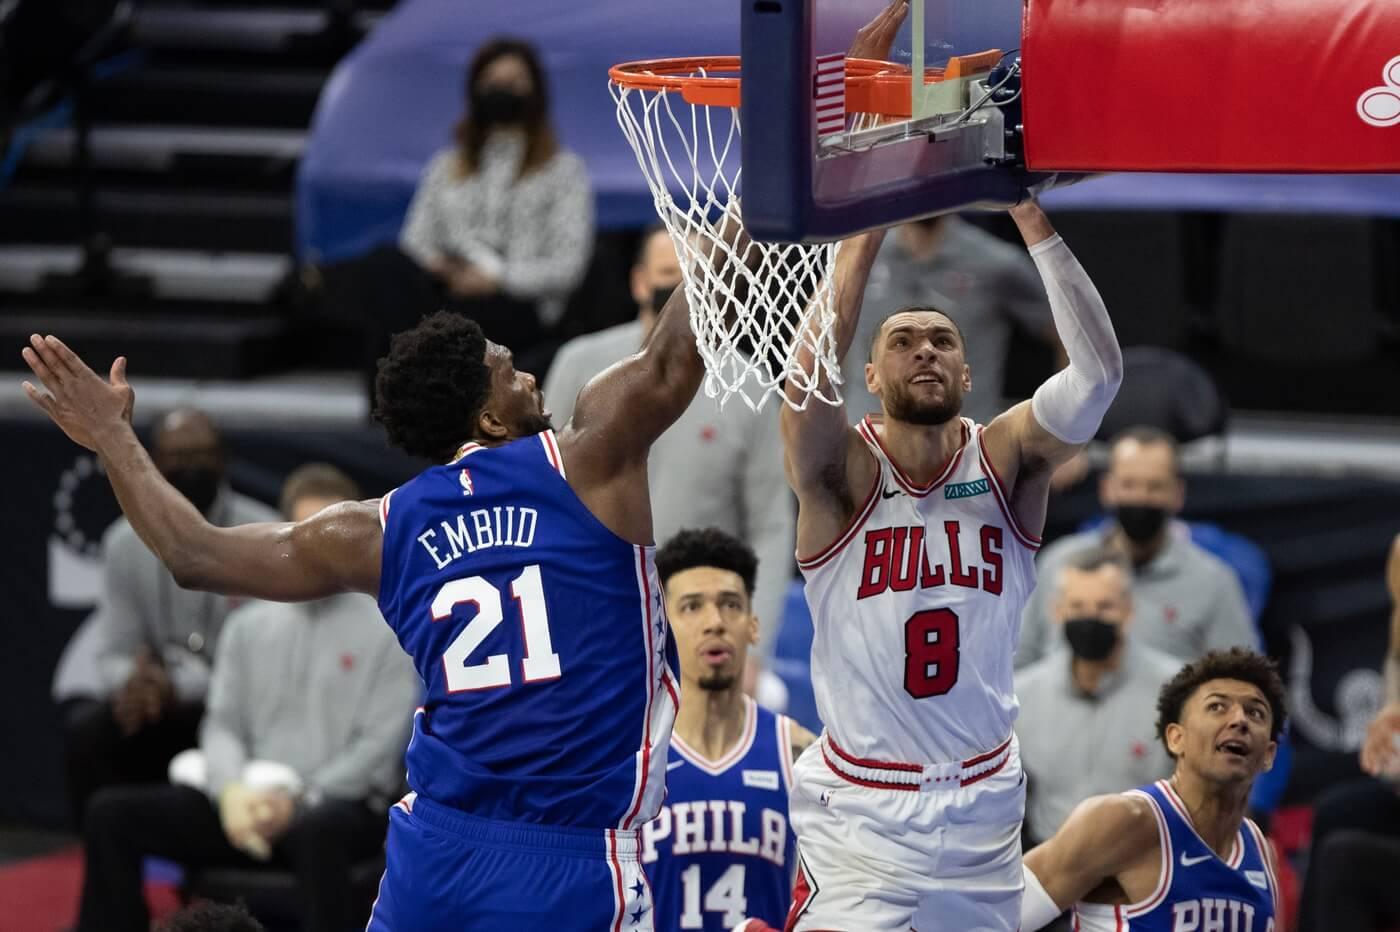 NBA Award Predictions Heading into the Second Half of the Season